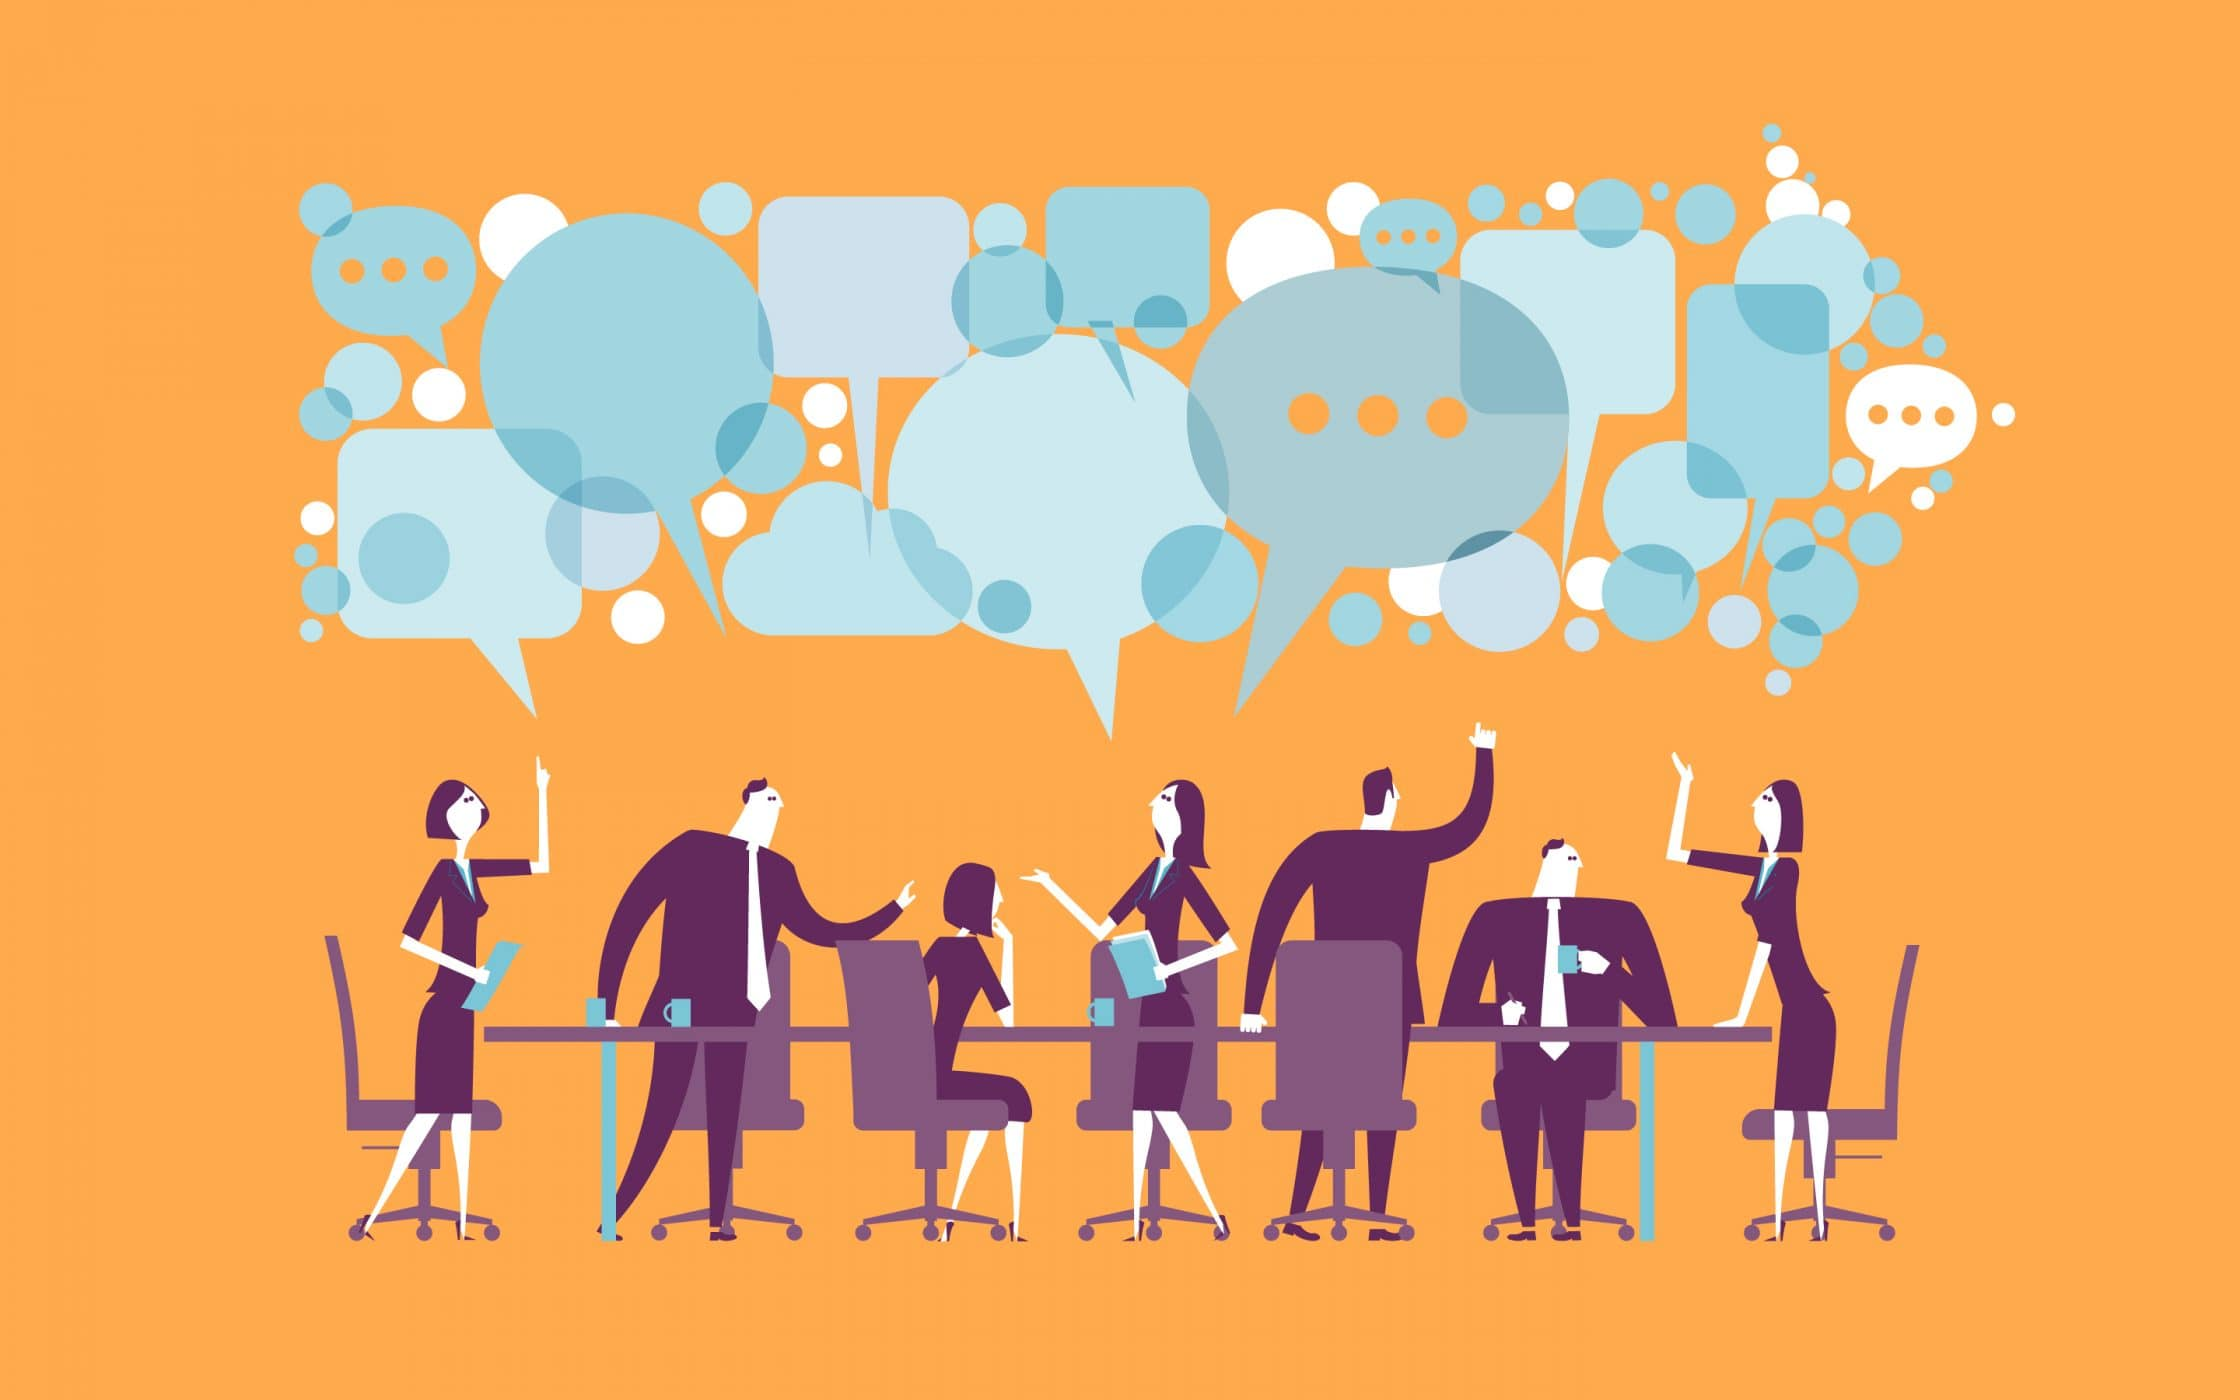 natura comunicarii in afaceri, comunicarea in afaceri, afaceri, comunicare, comunicarea in business